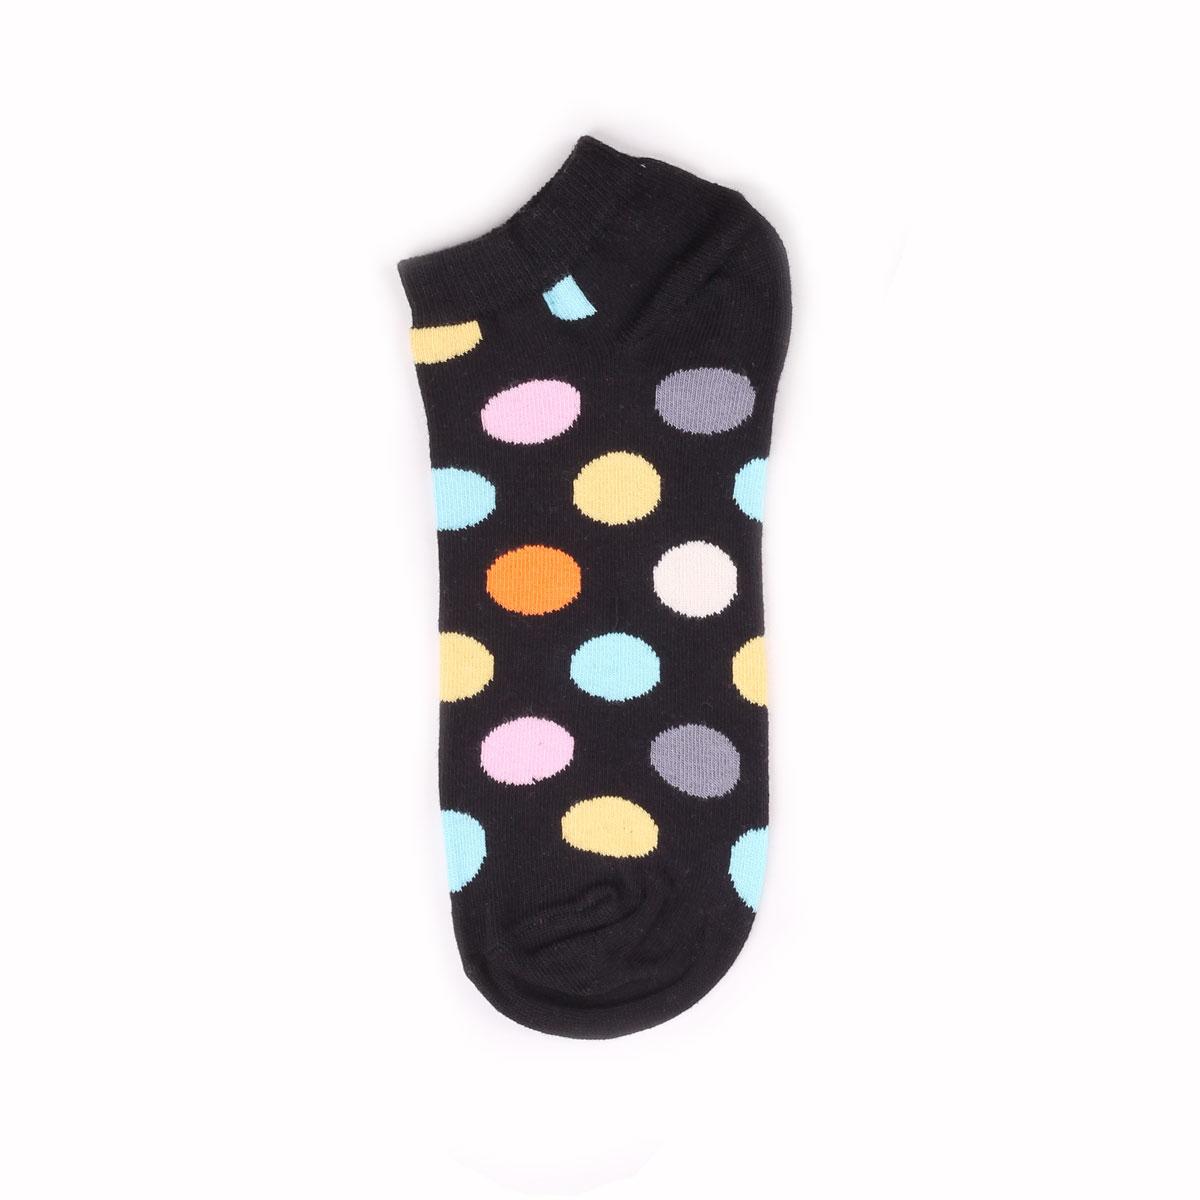 Носки унисекс Happy Socks Happy Socks Low Big Dot - Multicolor разноцветные 36-40